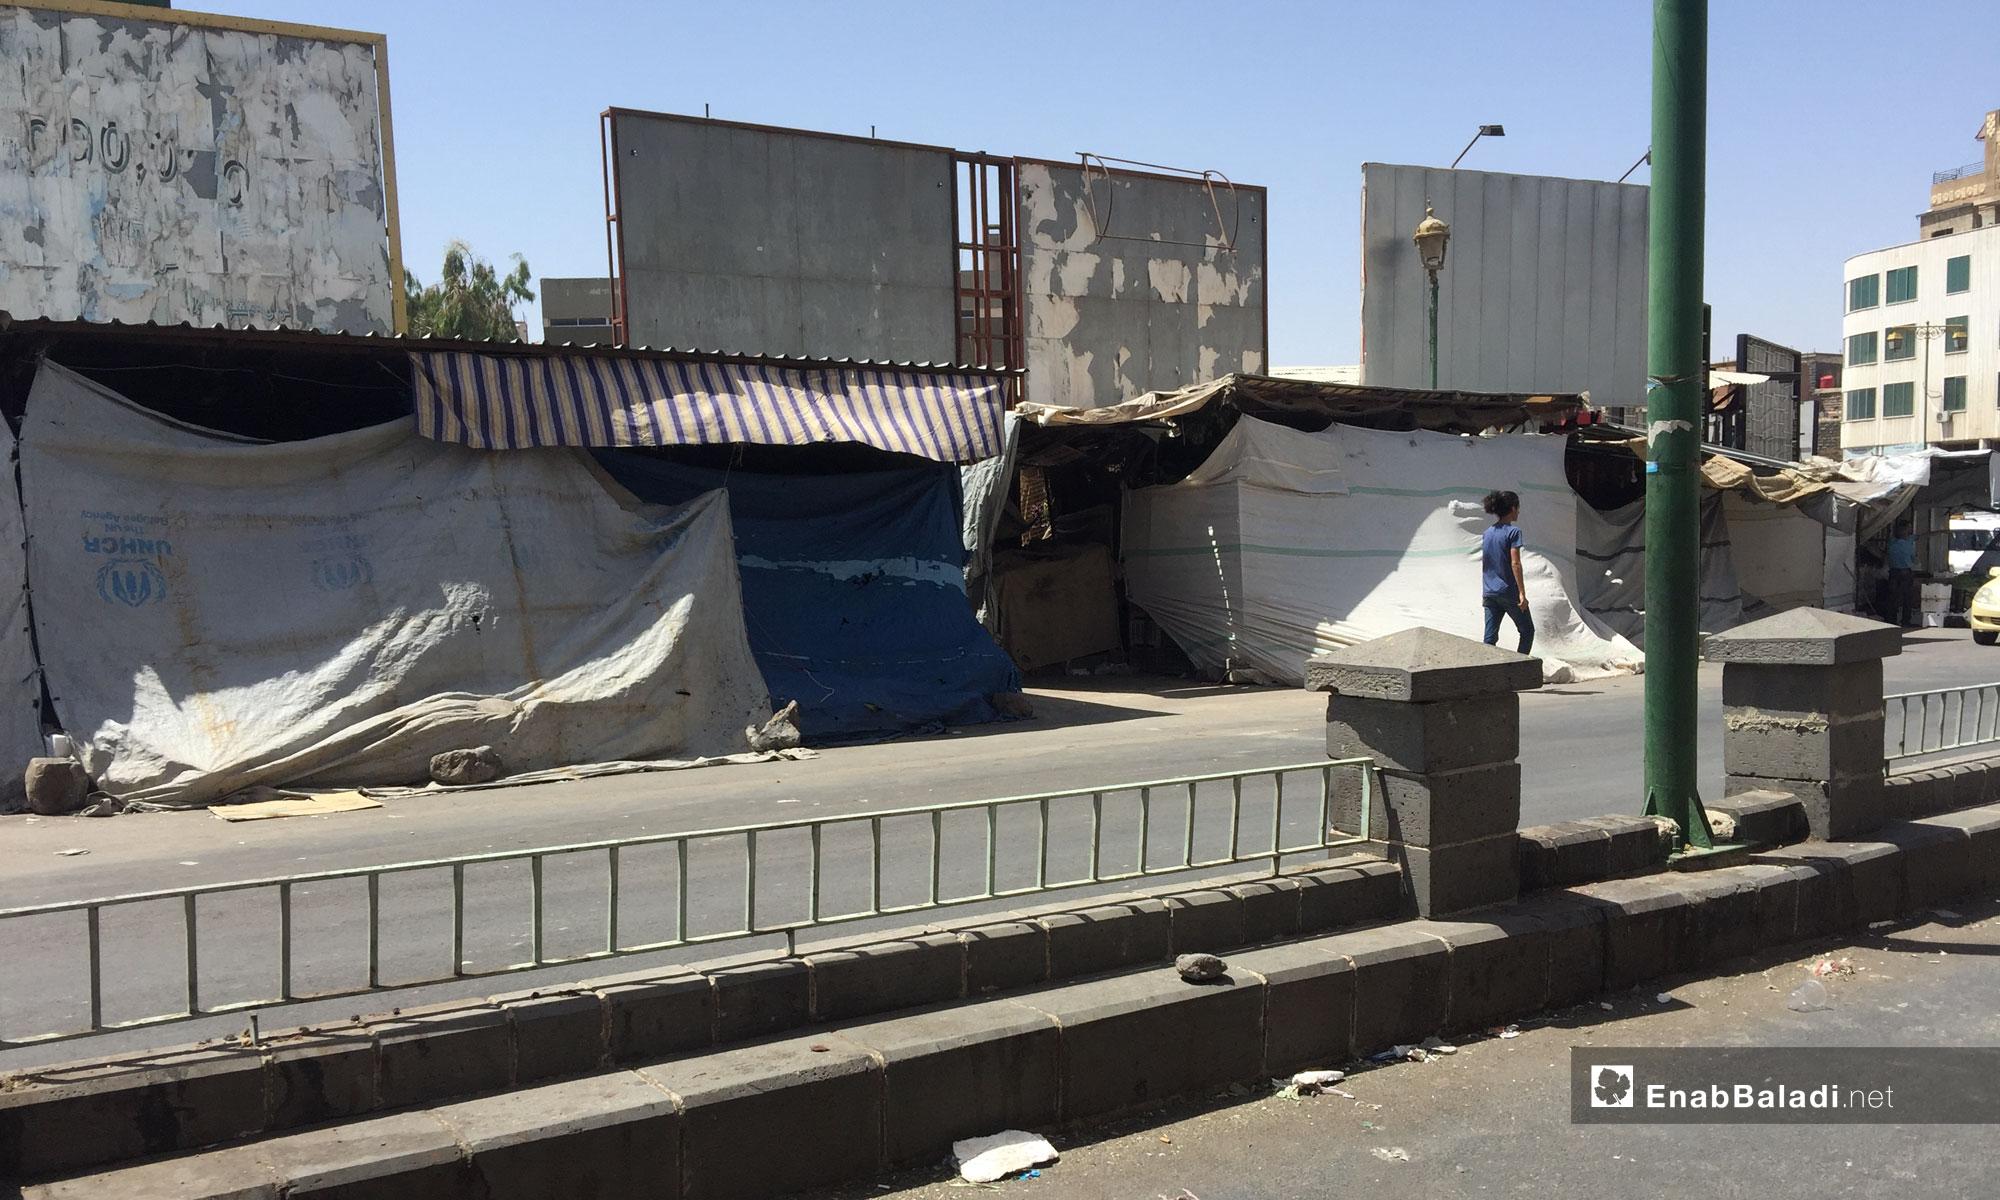 The vegetable market in Sweida city – July 26, 2018 (Enab Baladi)